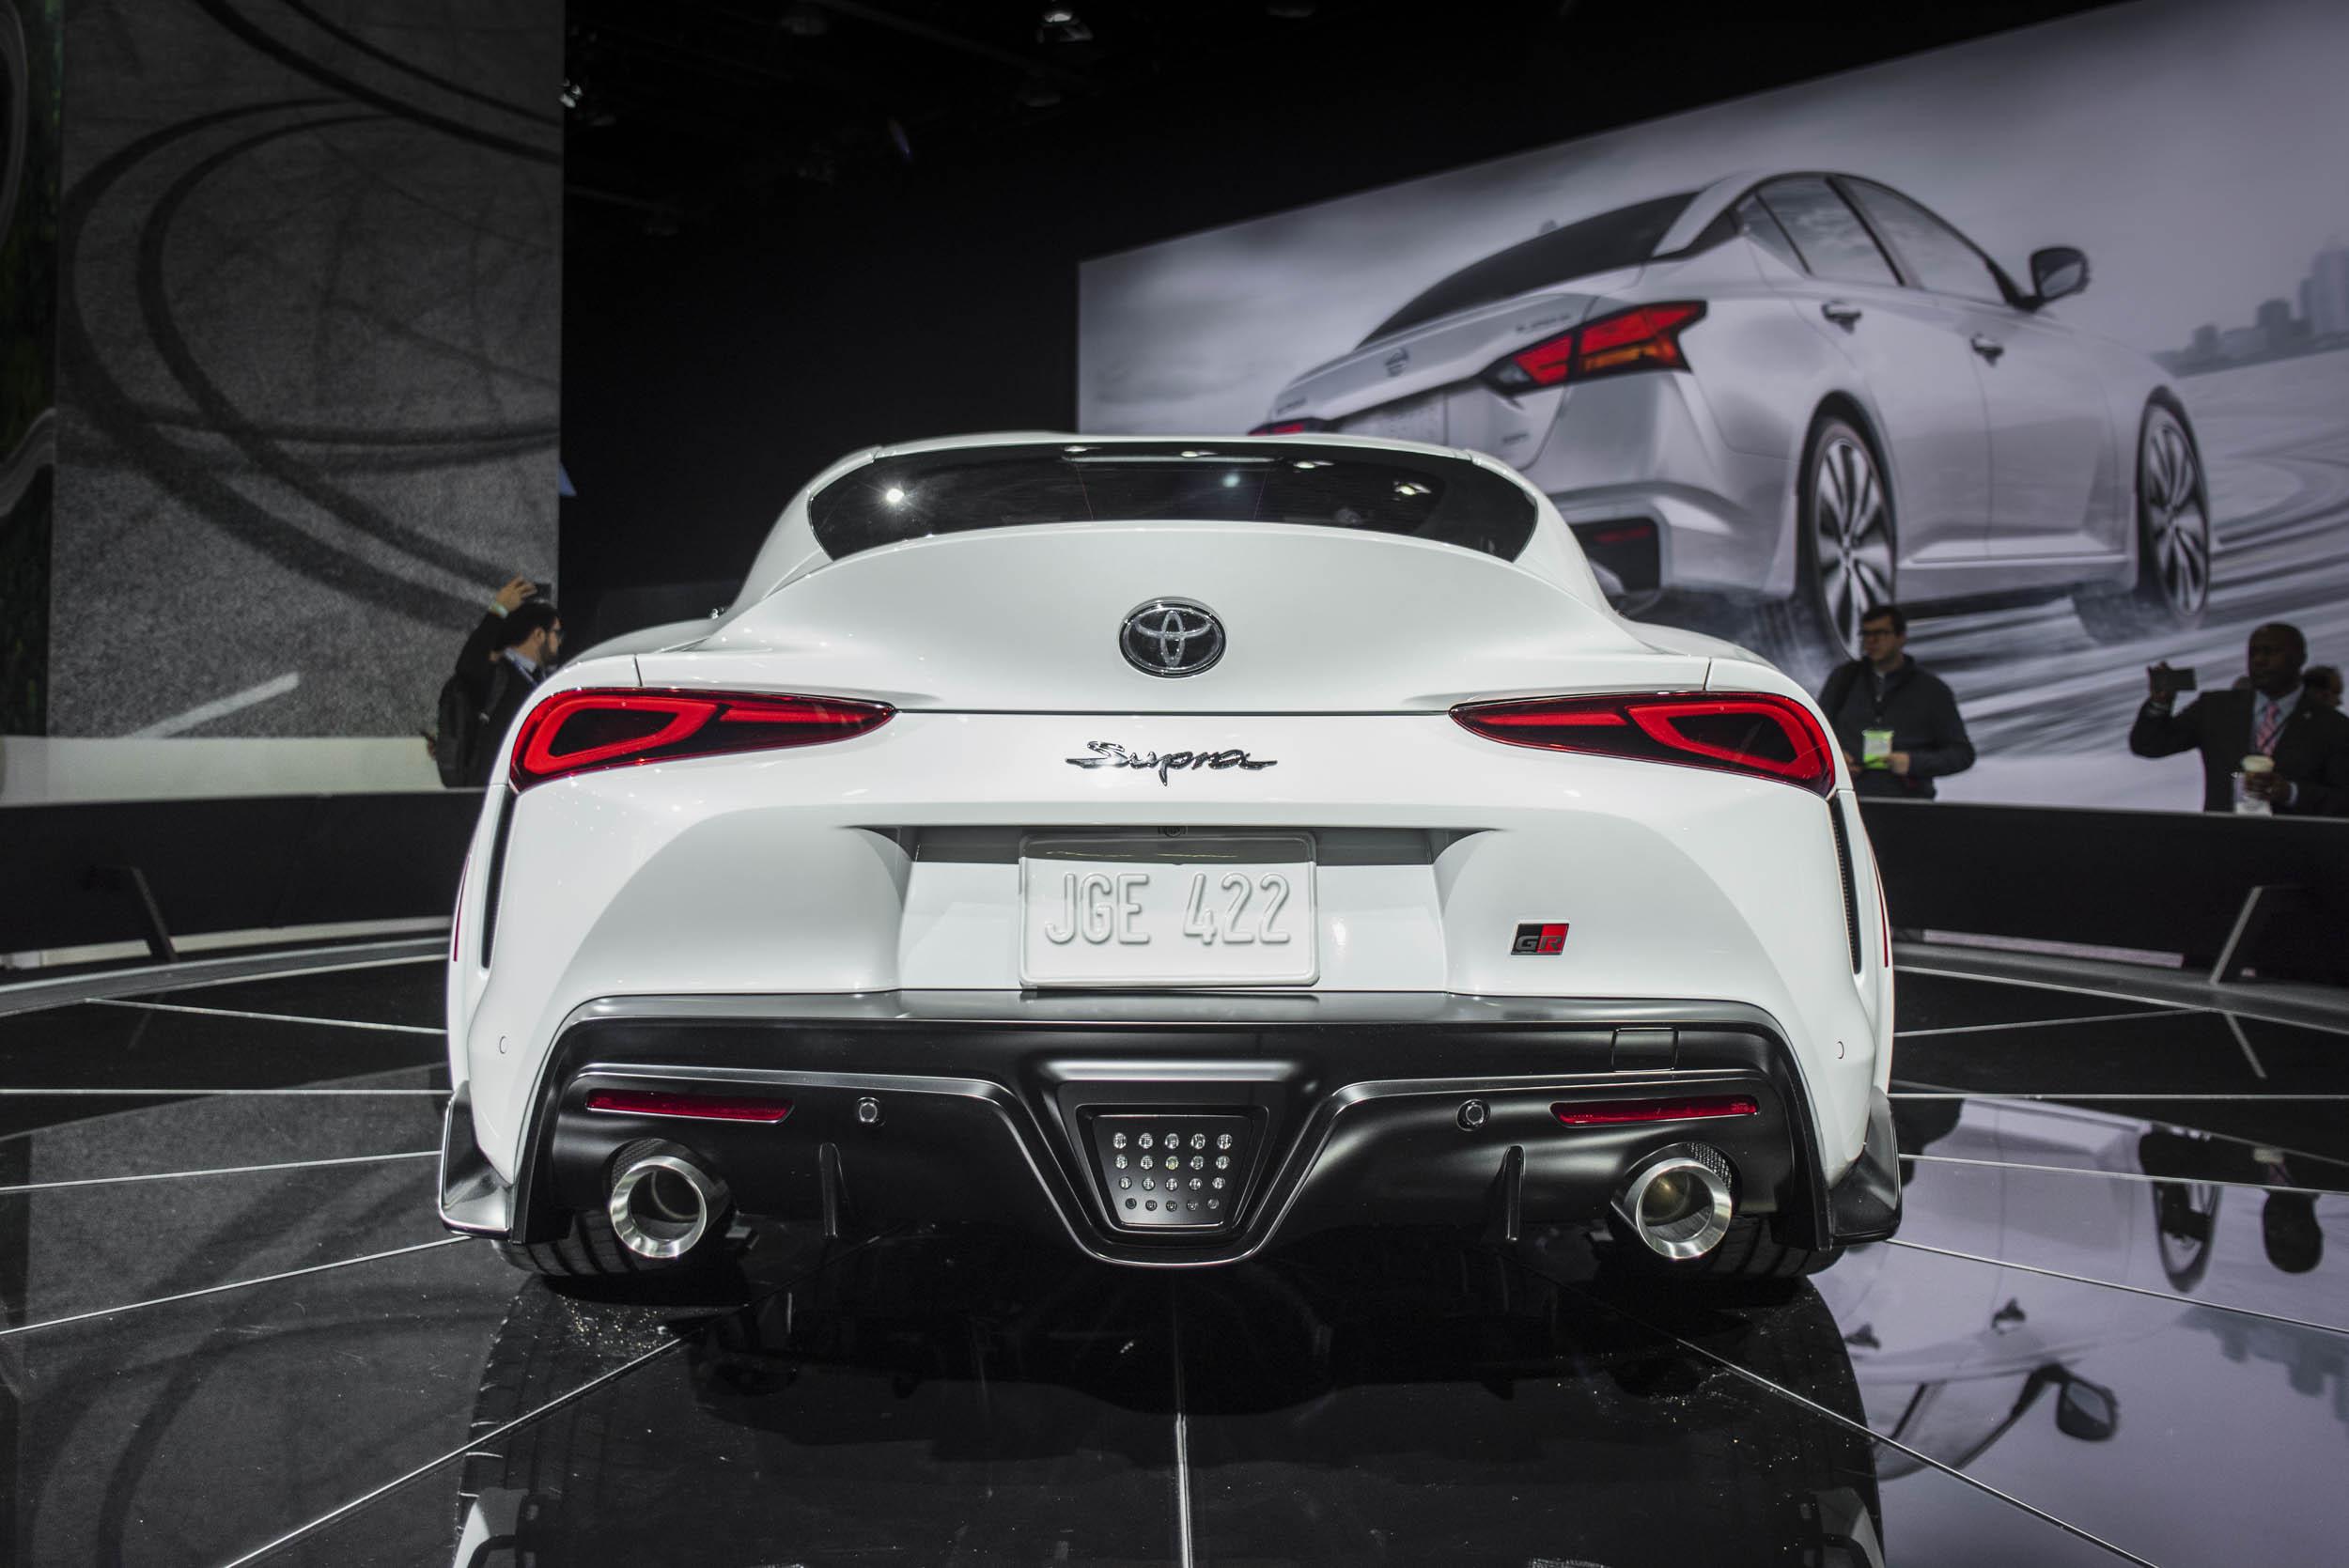 2020 Toyota Supra rear